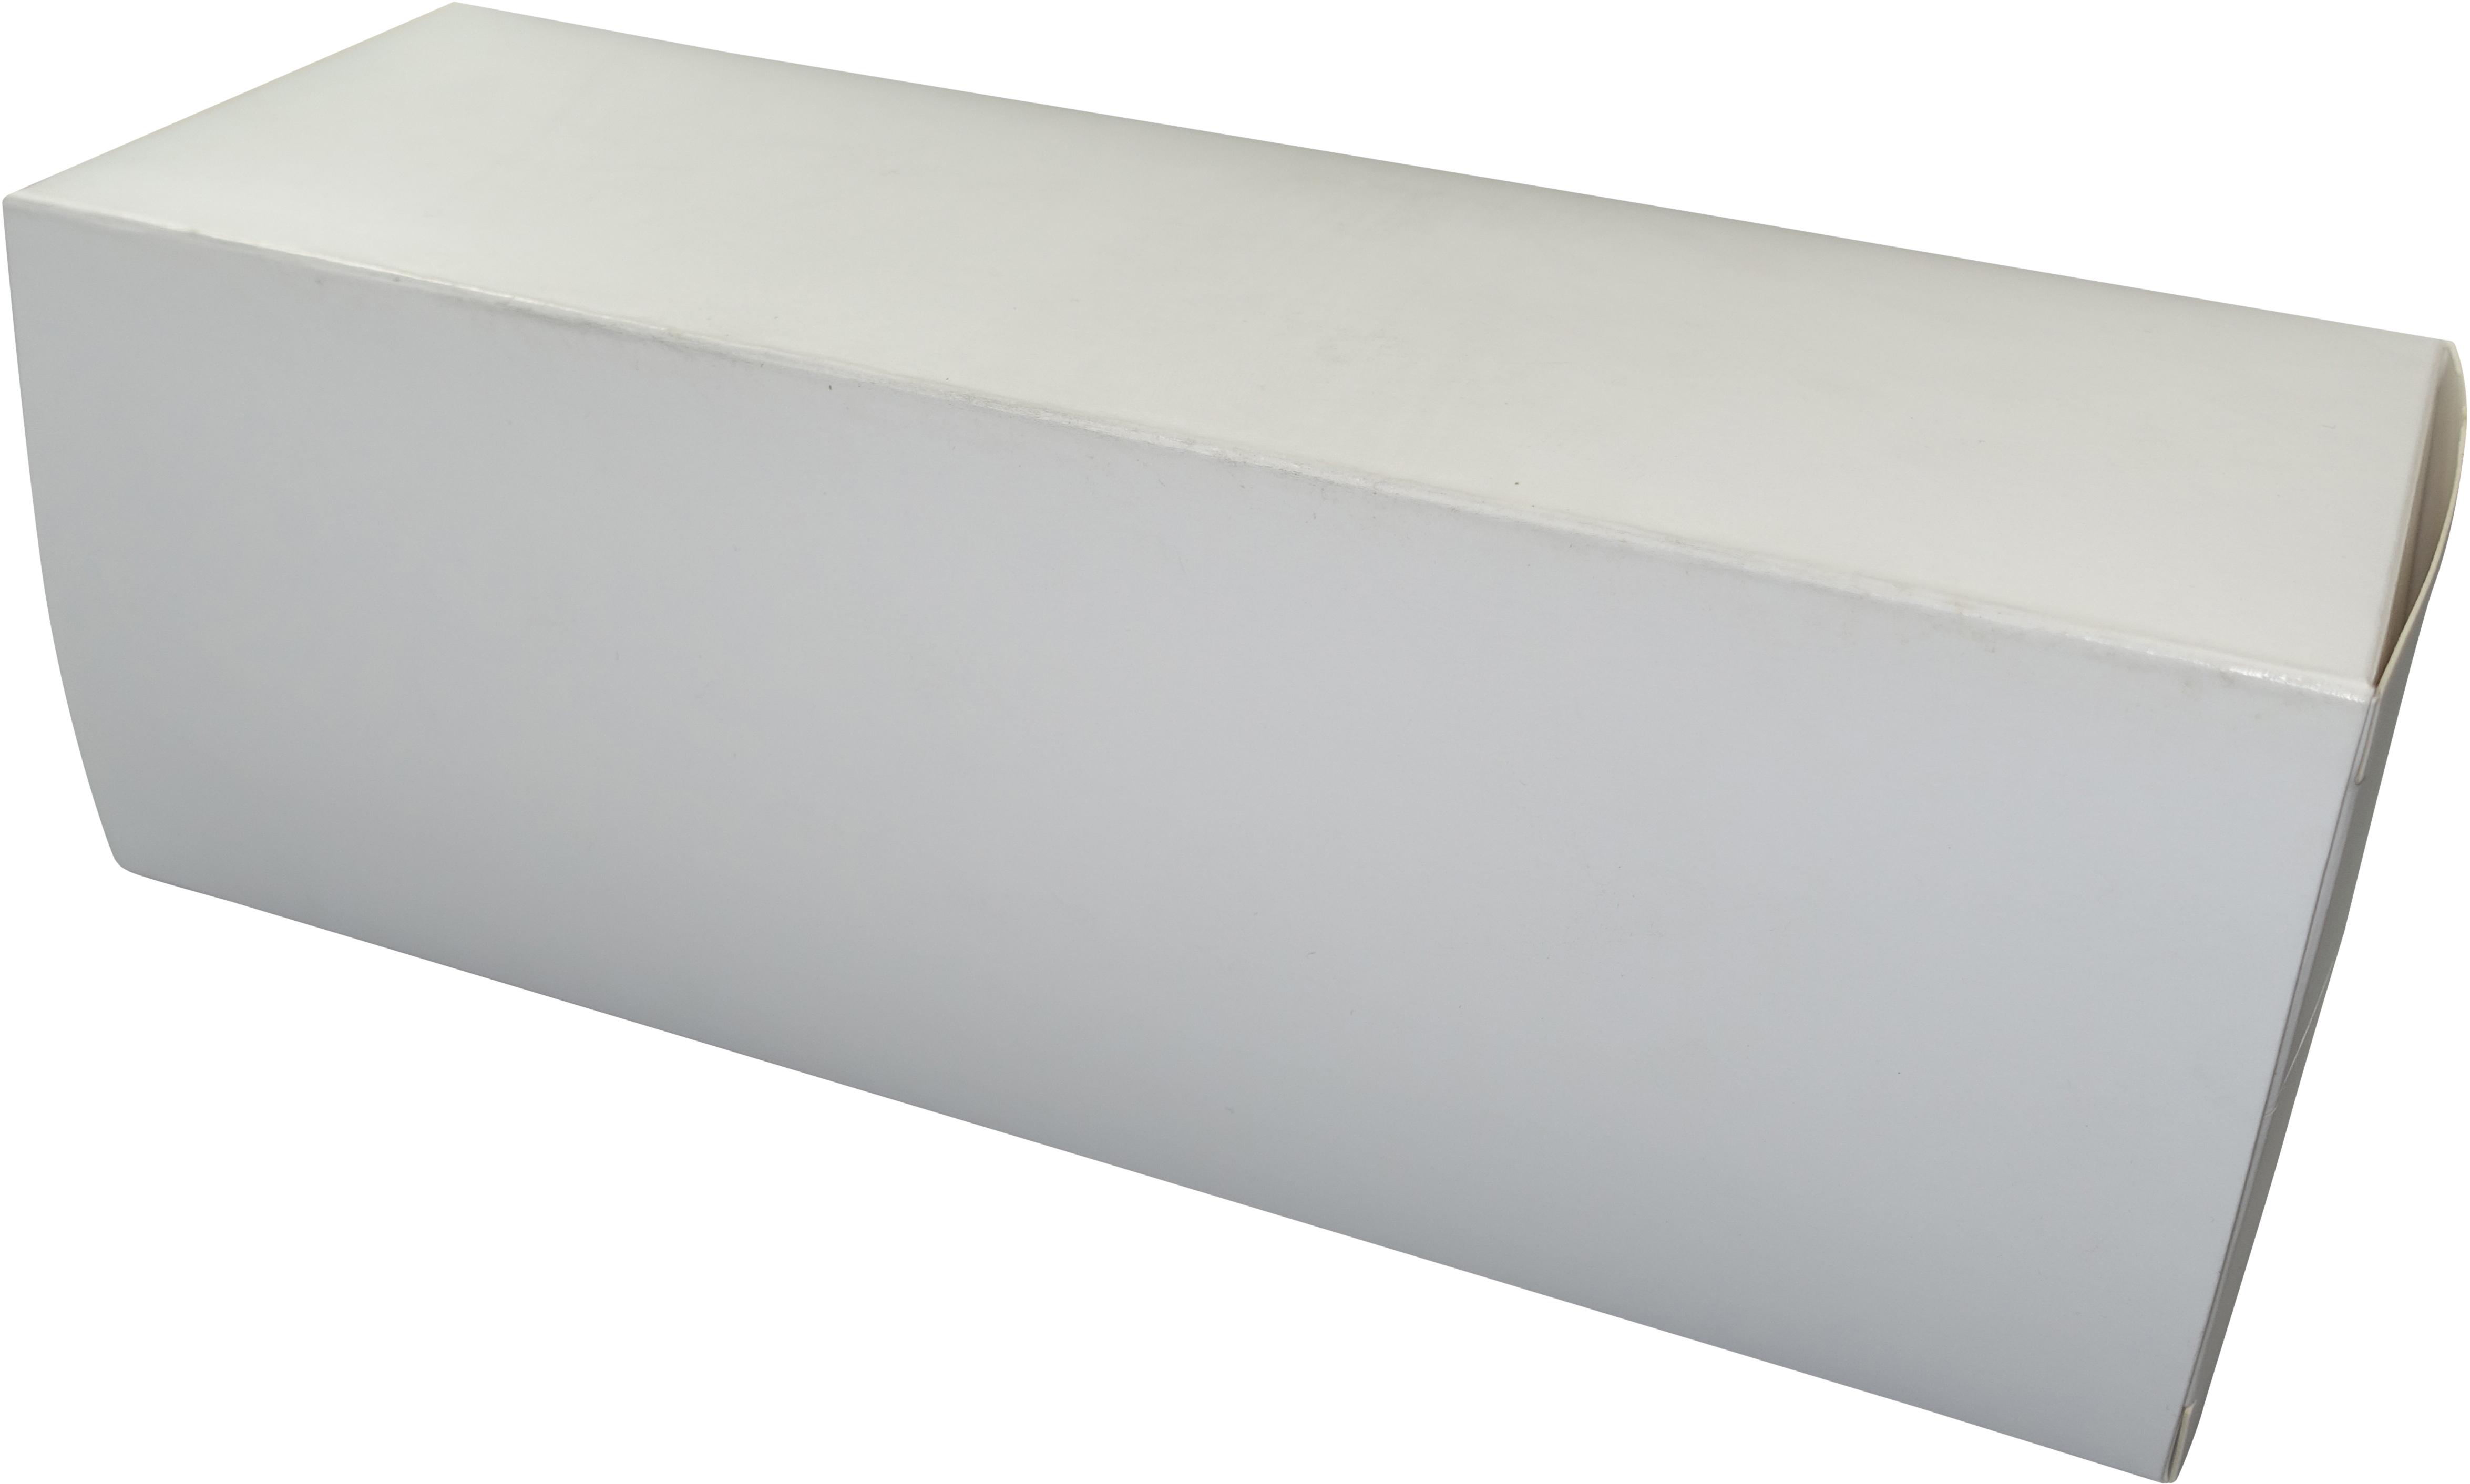 White Tube Box 3XL